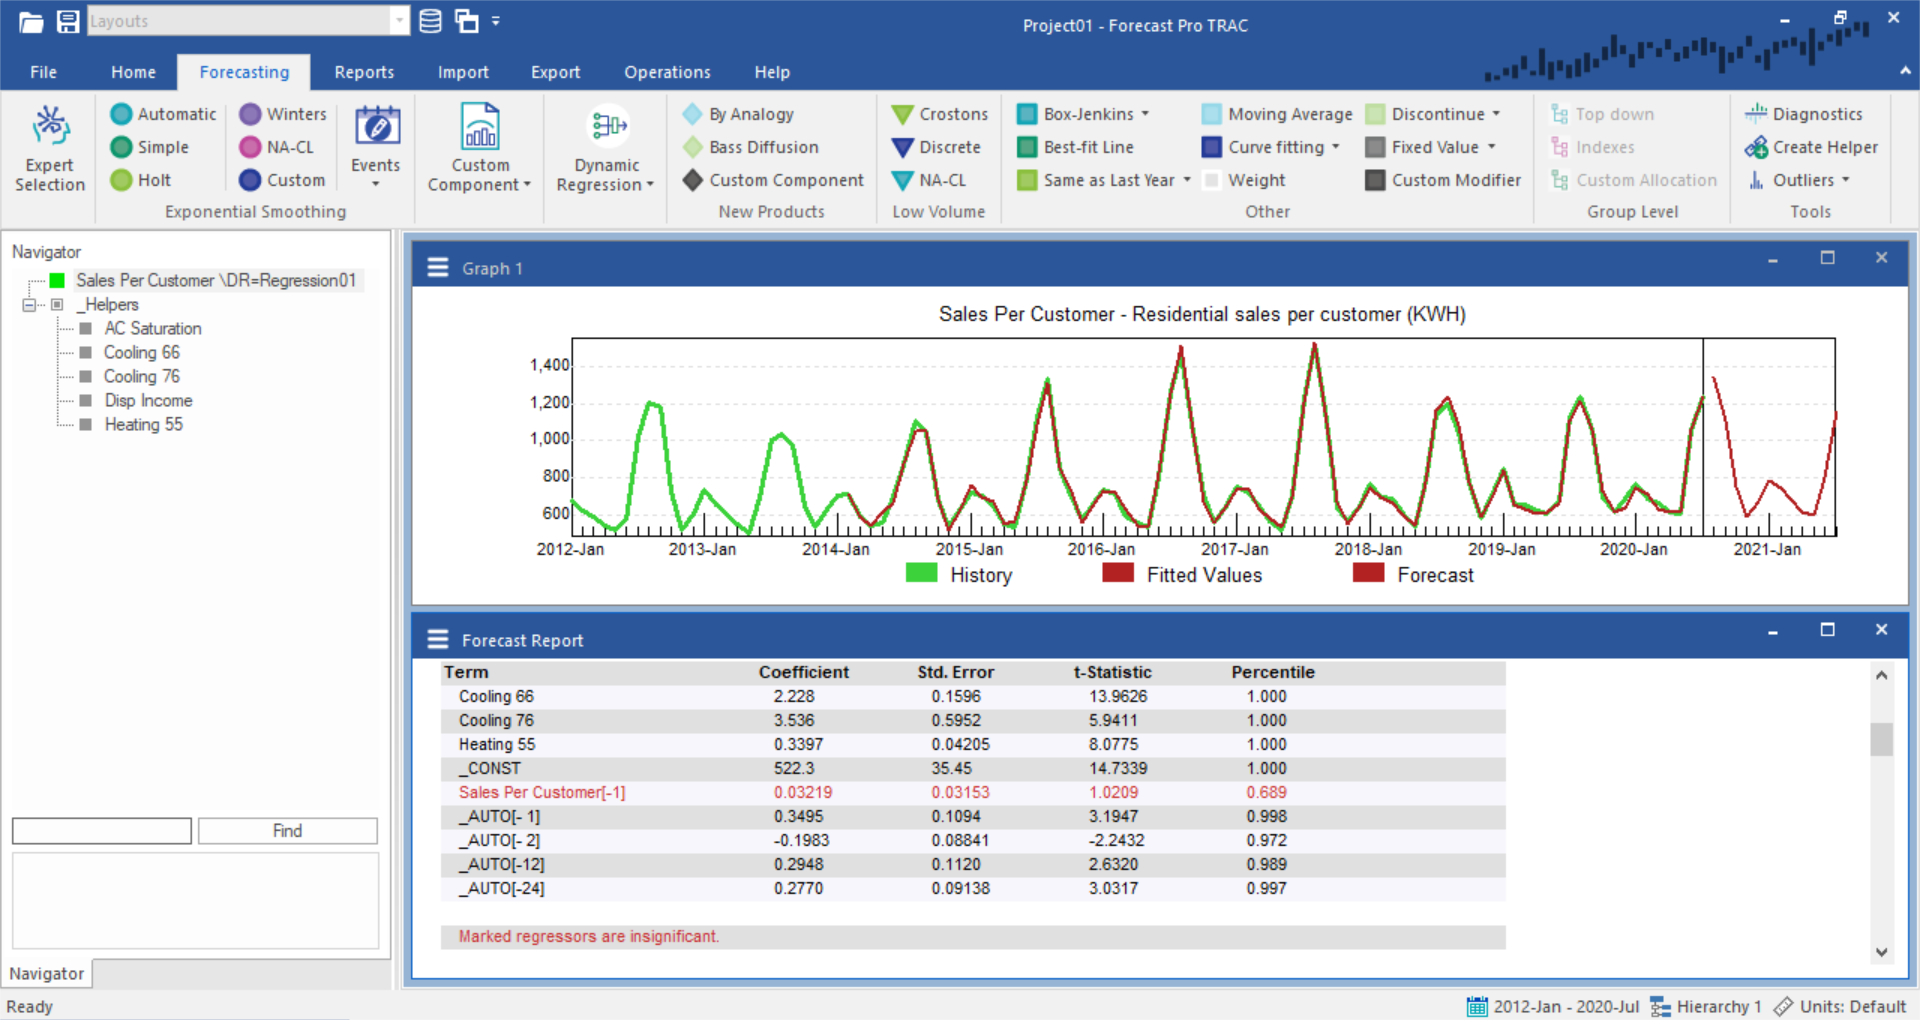 Forecast Pro TRAC Sales Forecast Regression Models